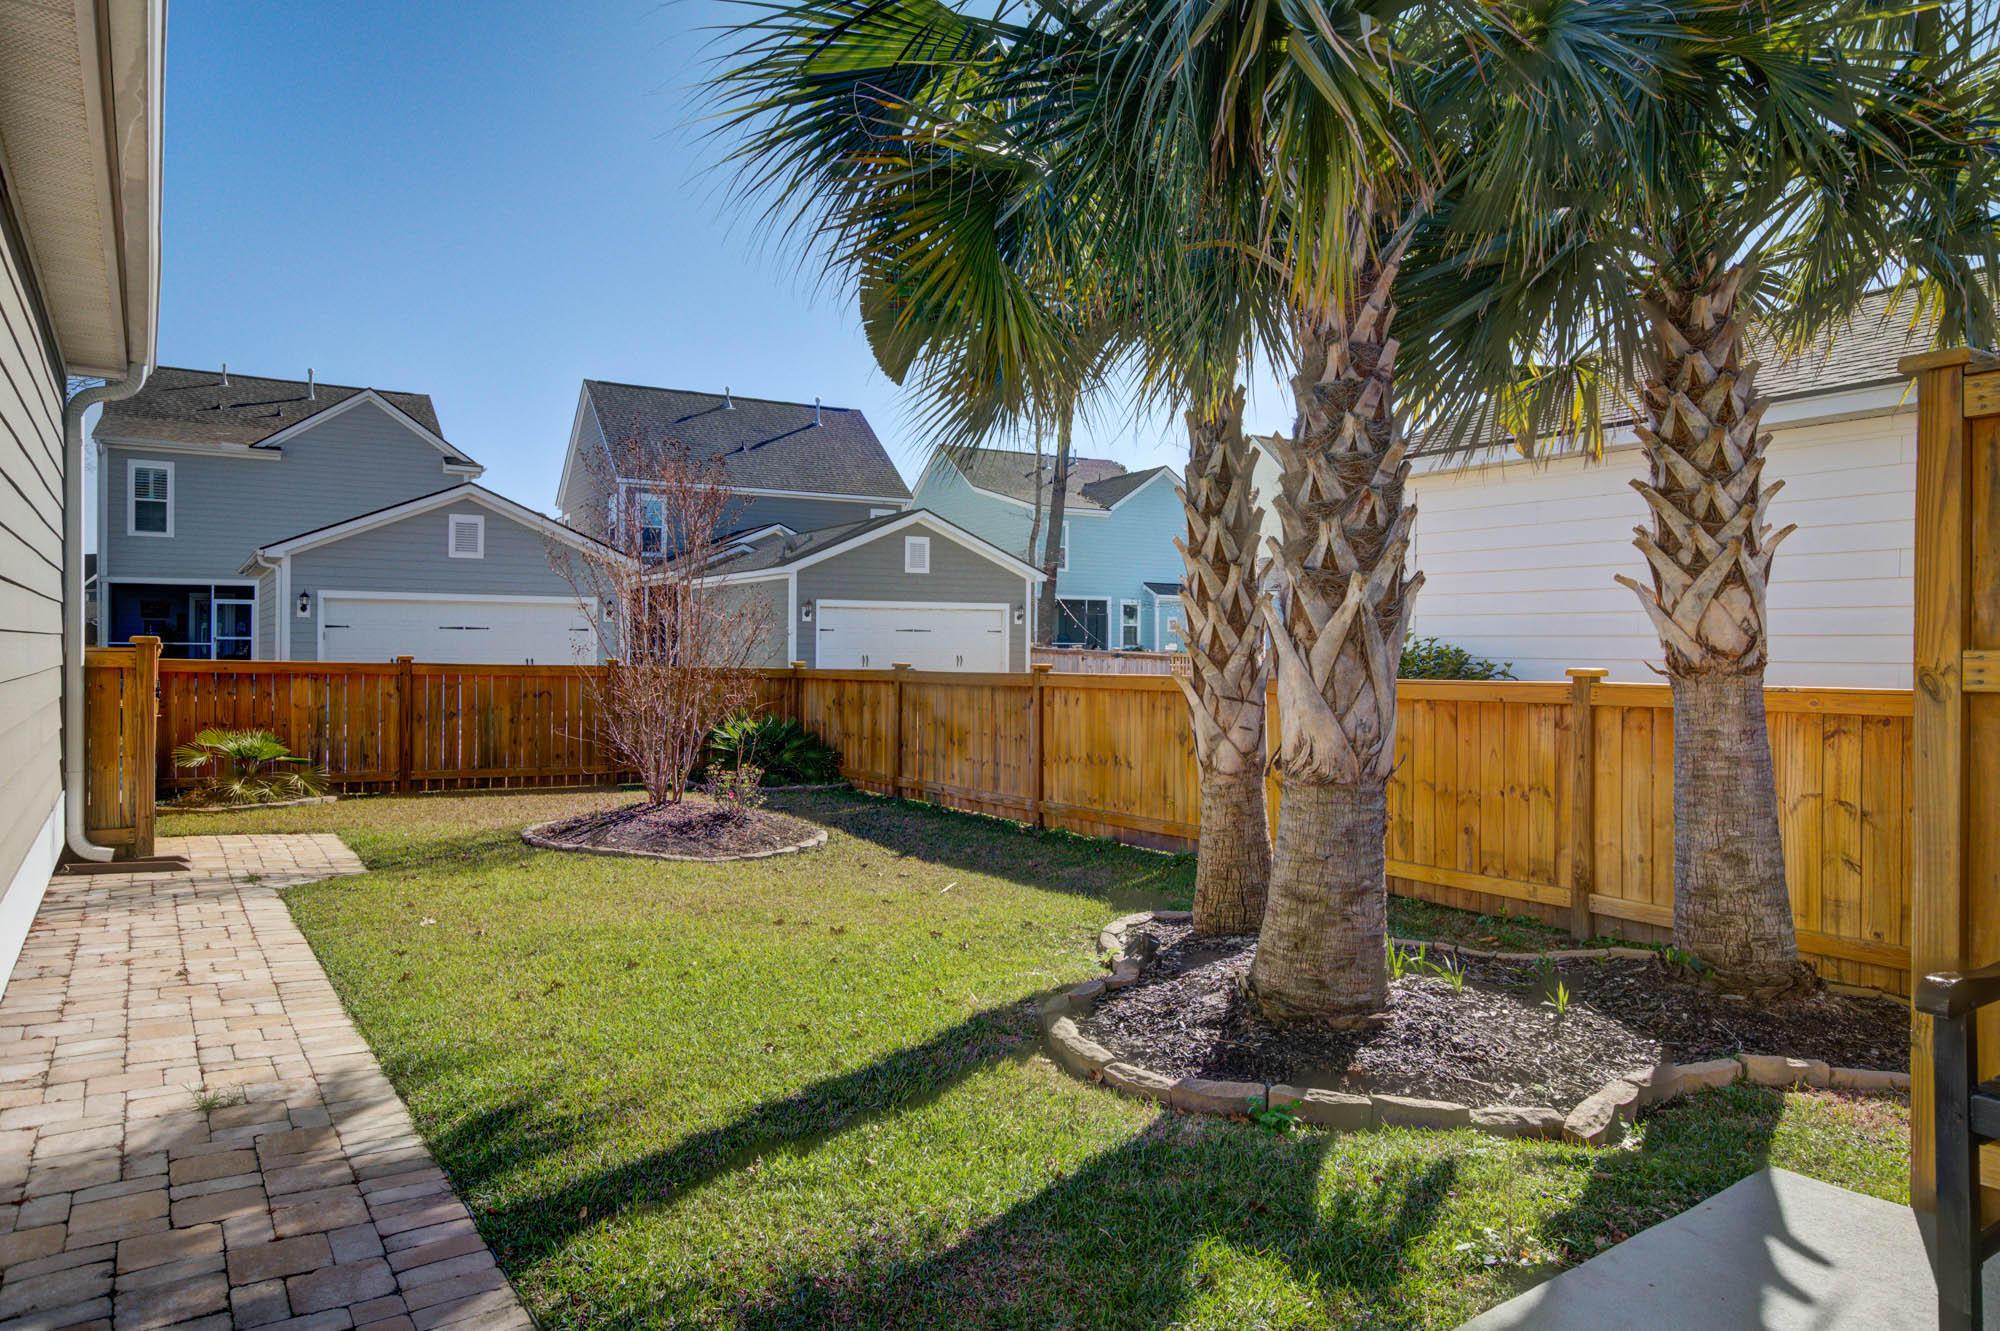 Carolina Bay Homes For Sale - 1850 Grovehurst, Charleston, SC - 11